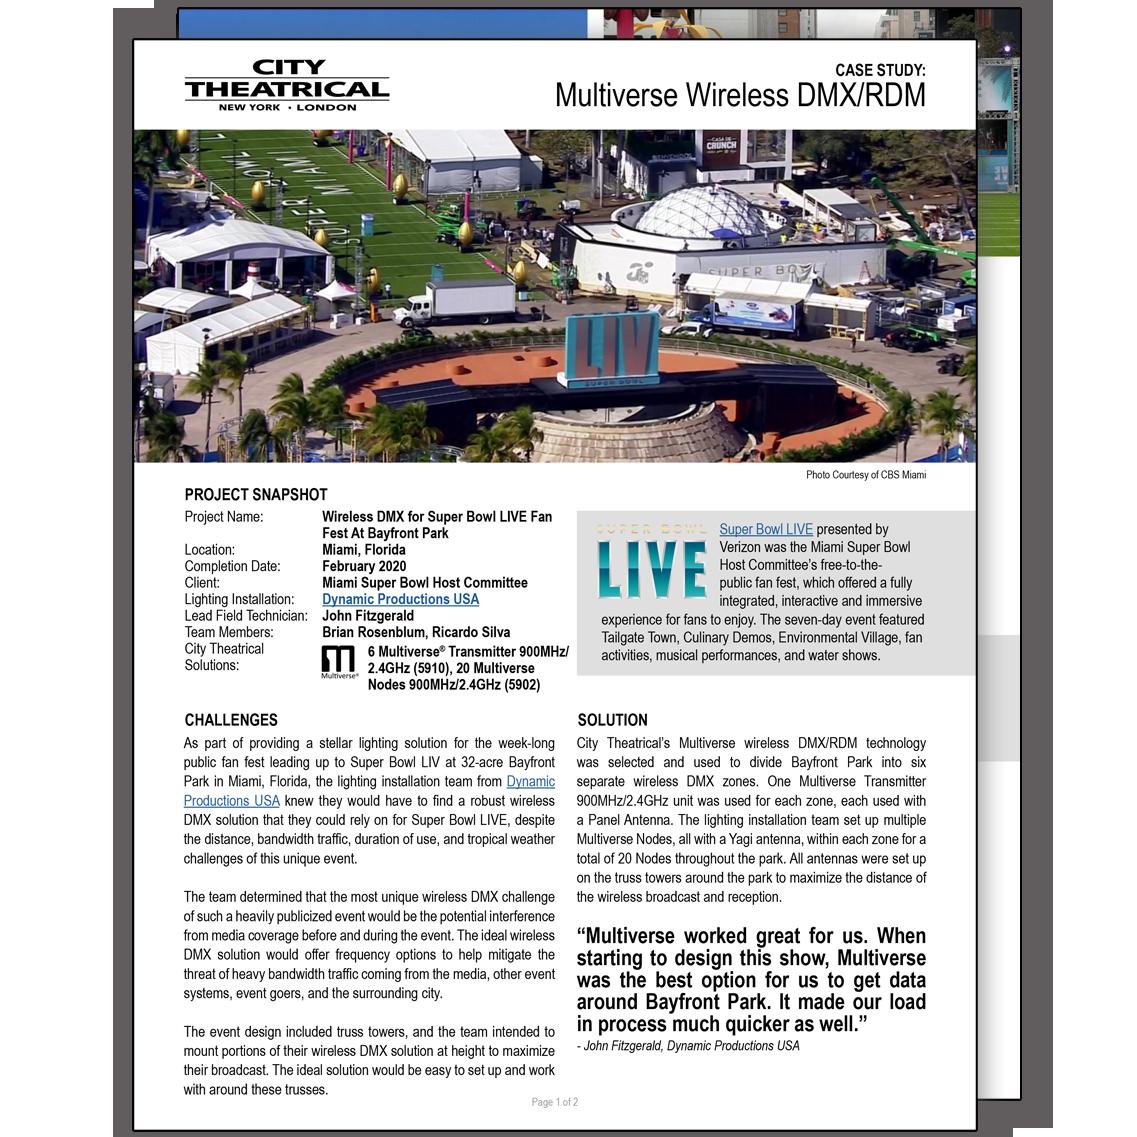 Multiverse at Super Bowl LIVE Case Study